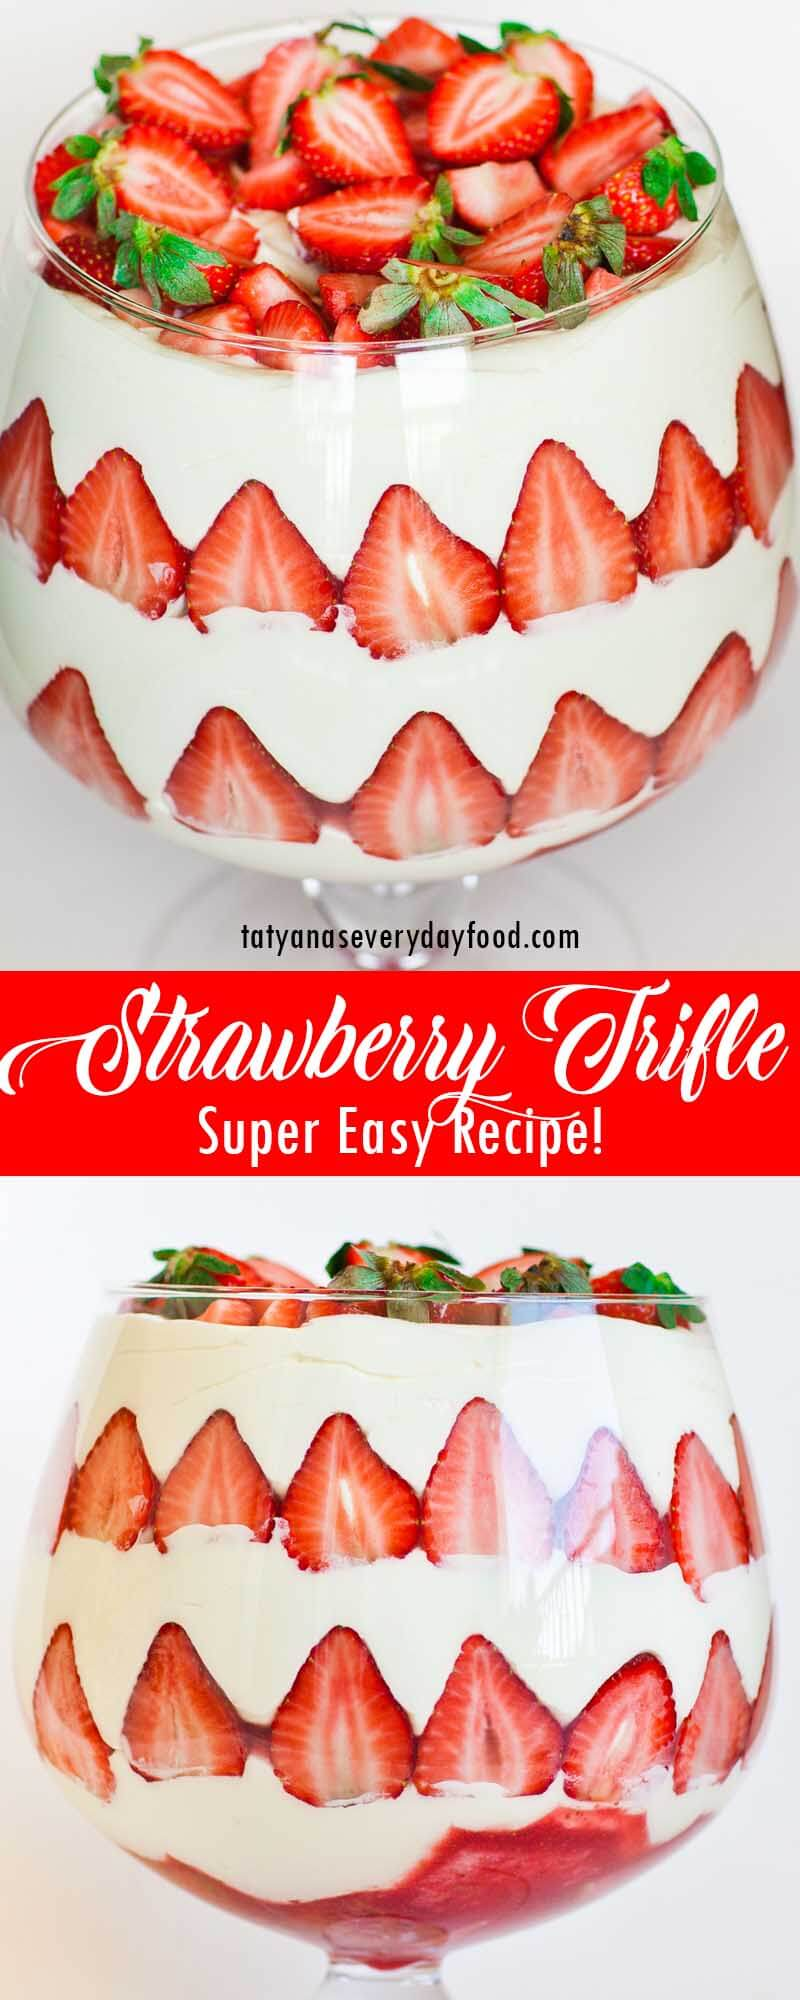 Easy Strawberry Trifle video recipe